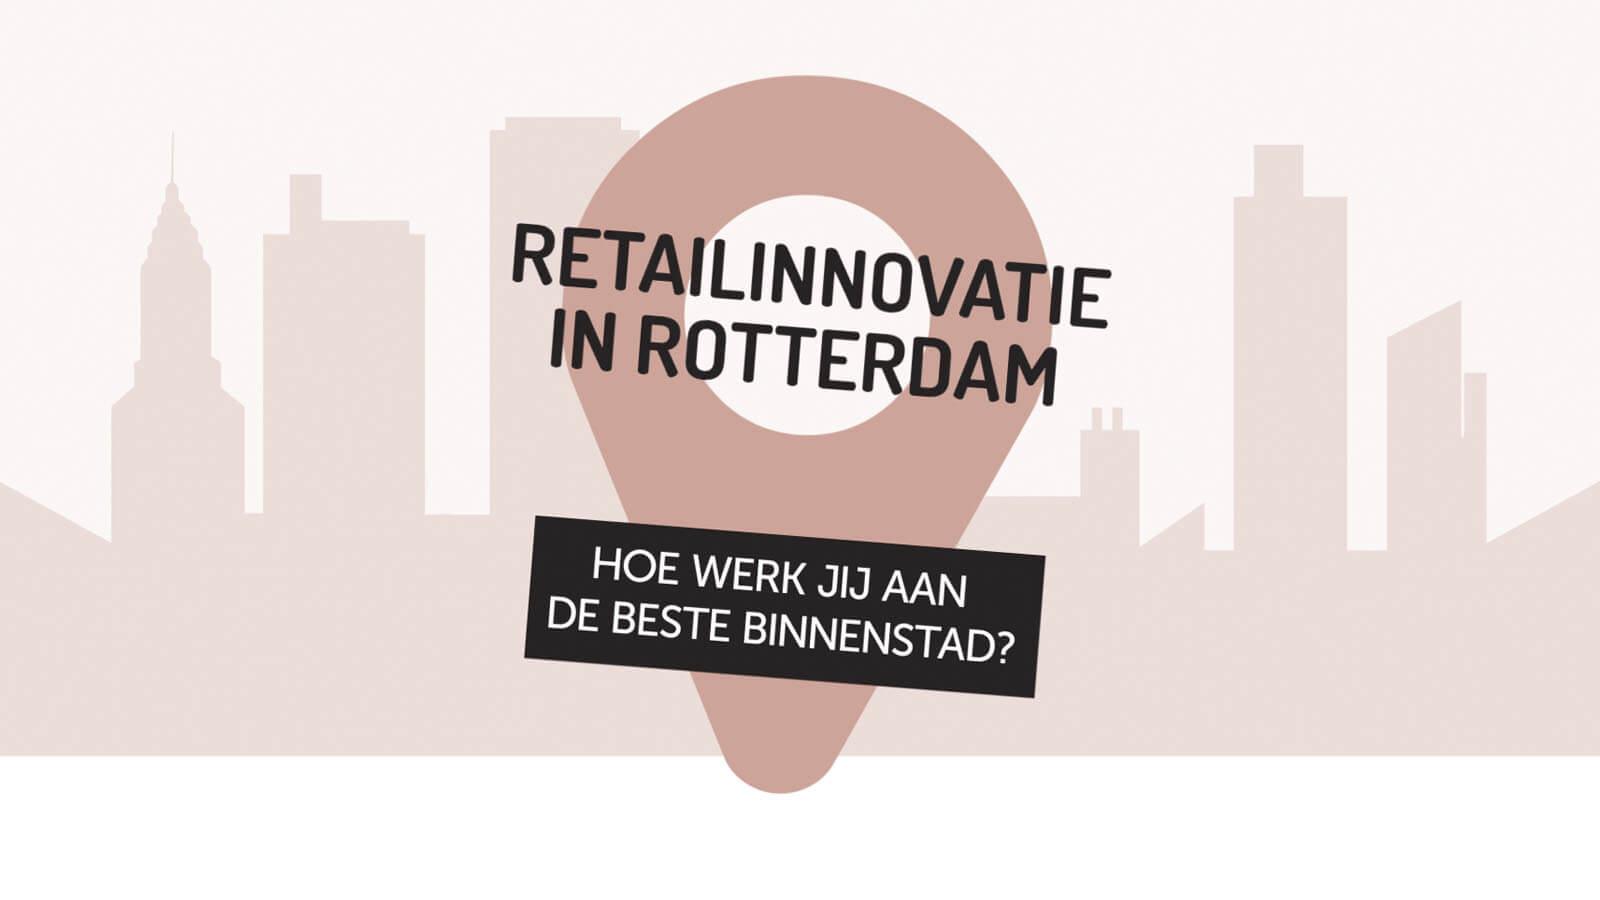 Retail Innovatie Rotterdam video